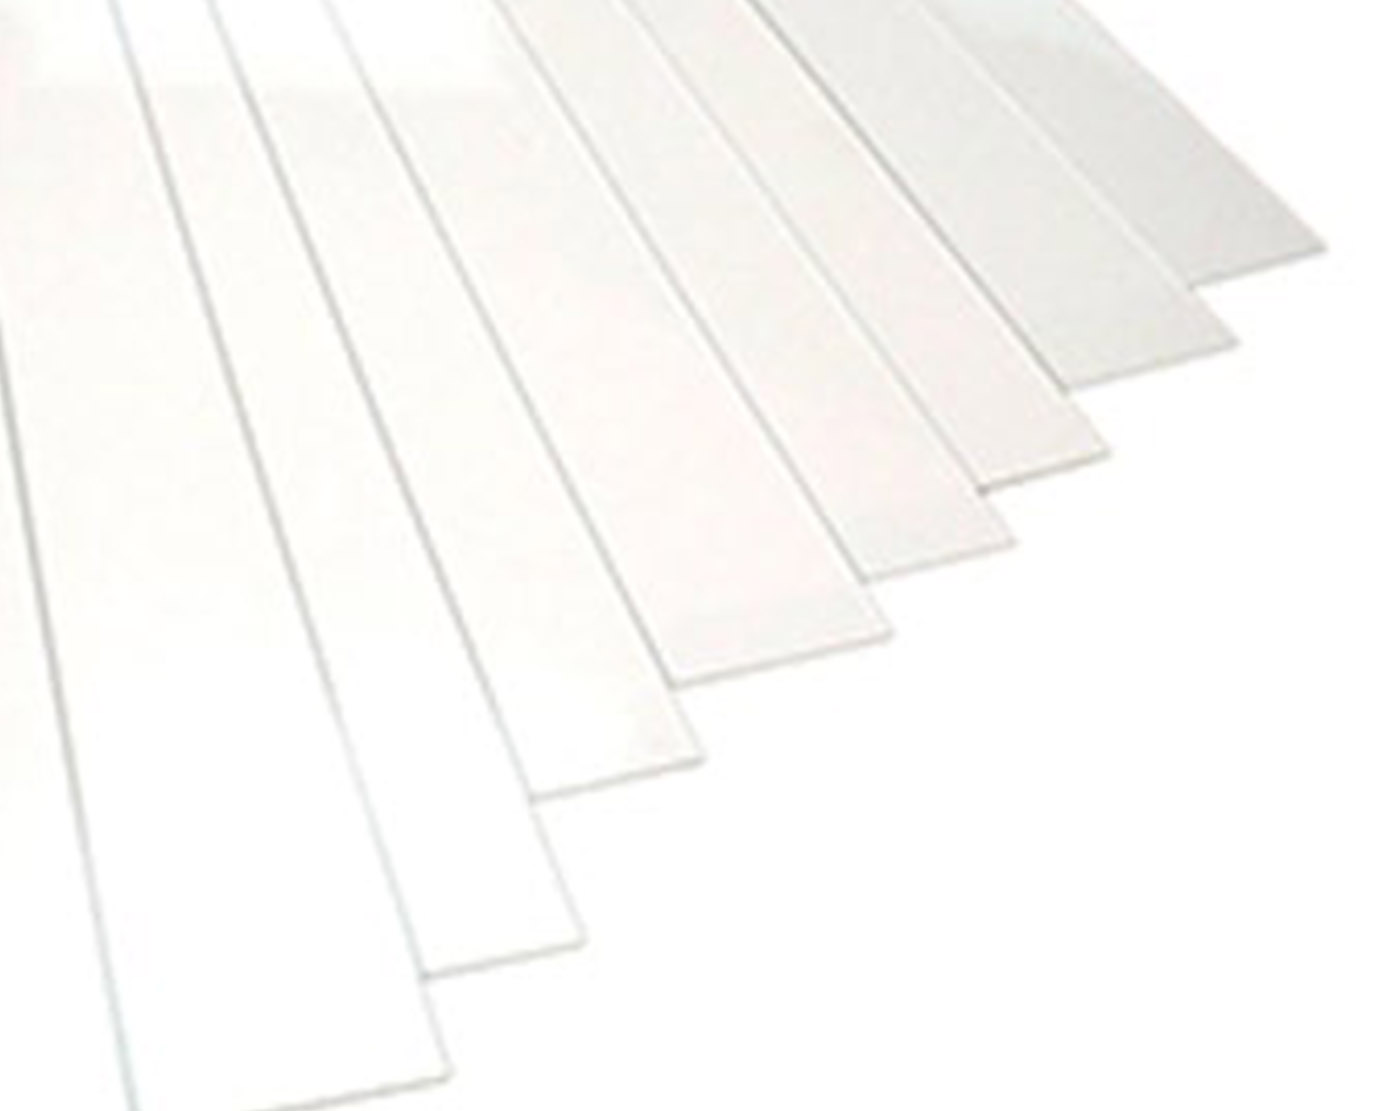 blank styrene sheets